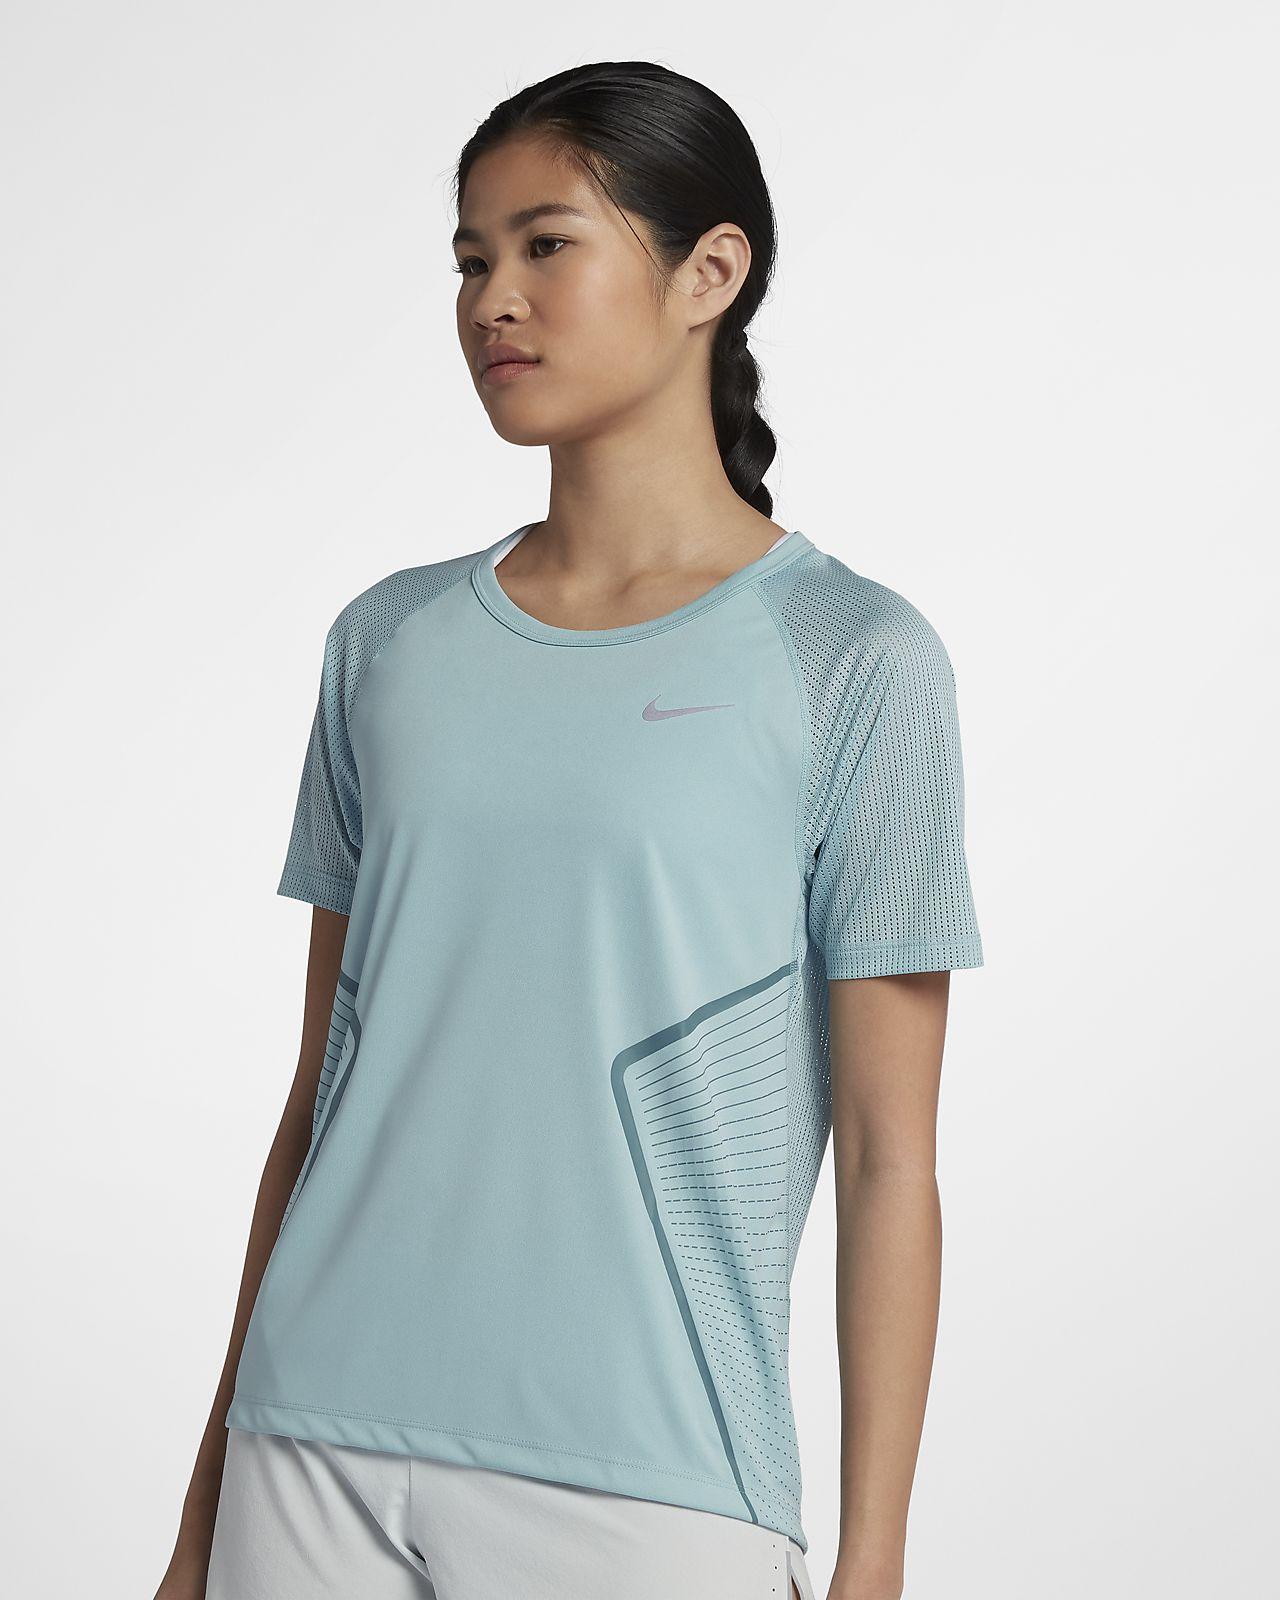 ... Nike Dri-FIT Miler Women's Short-Sleeve Running Top